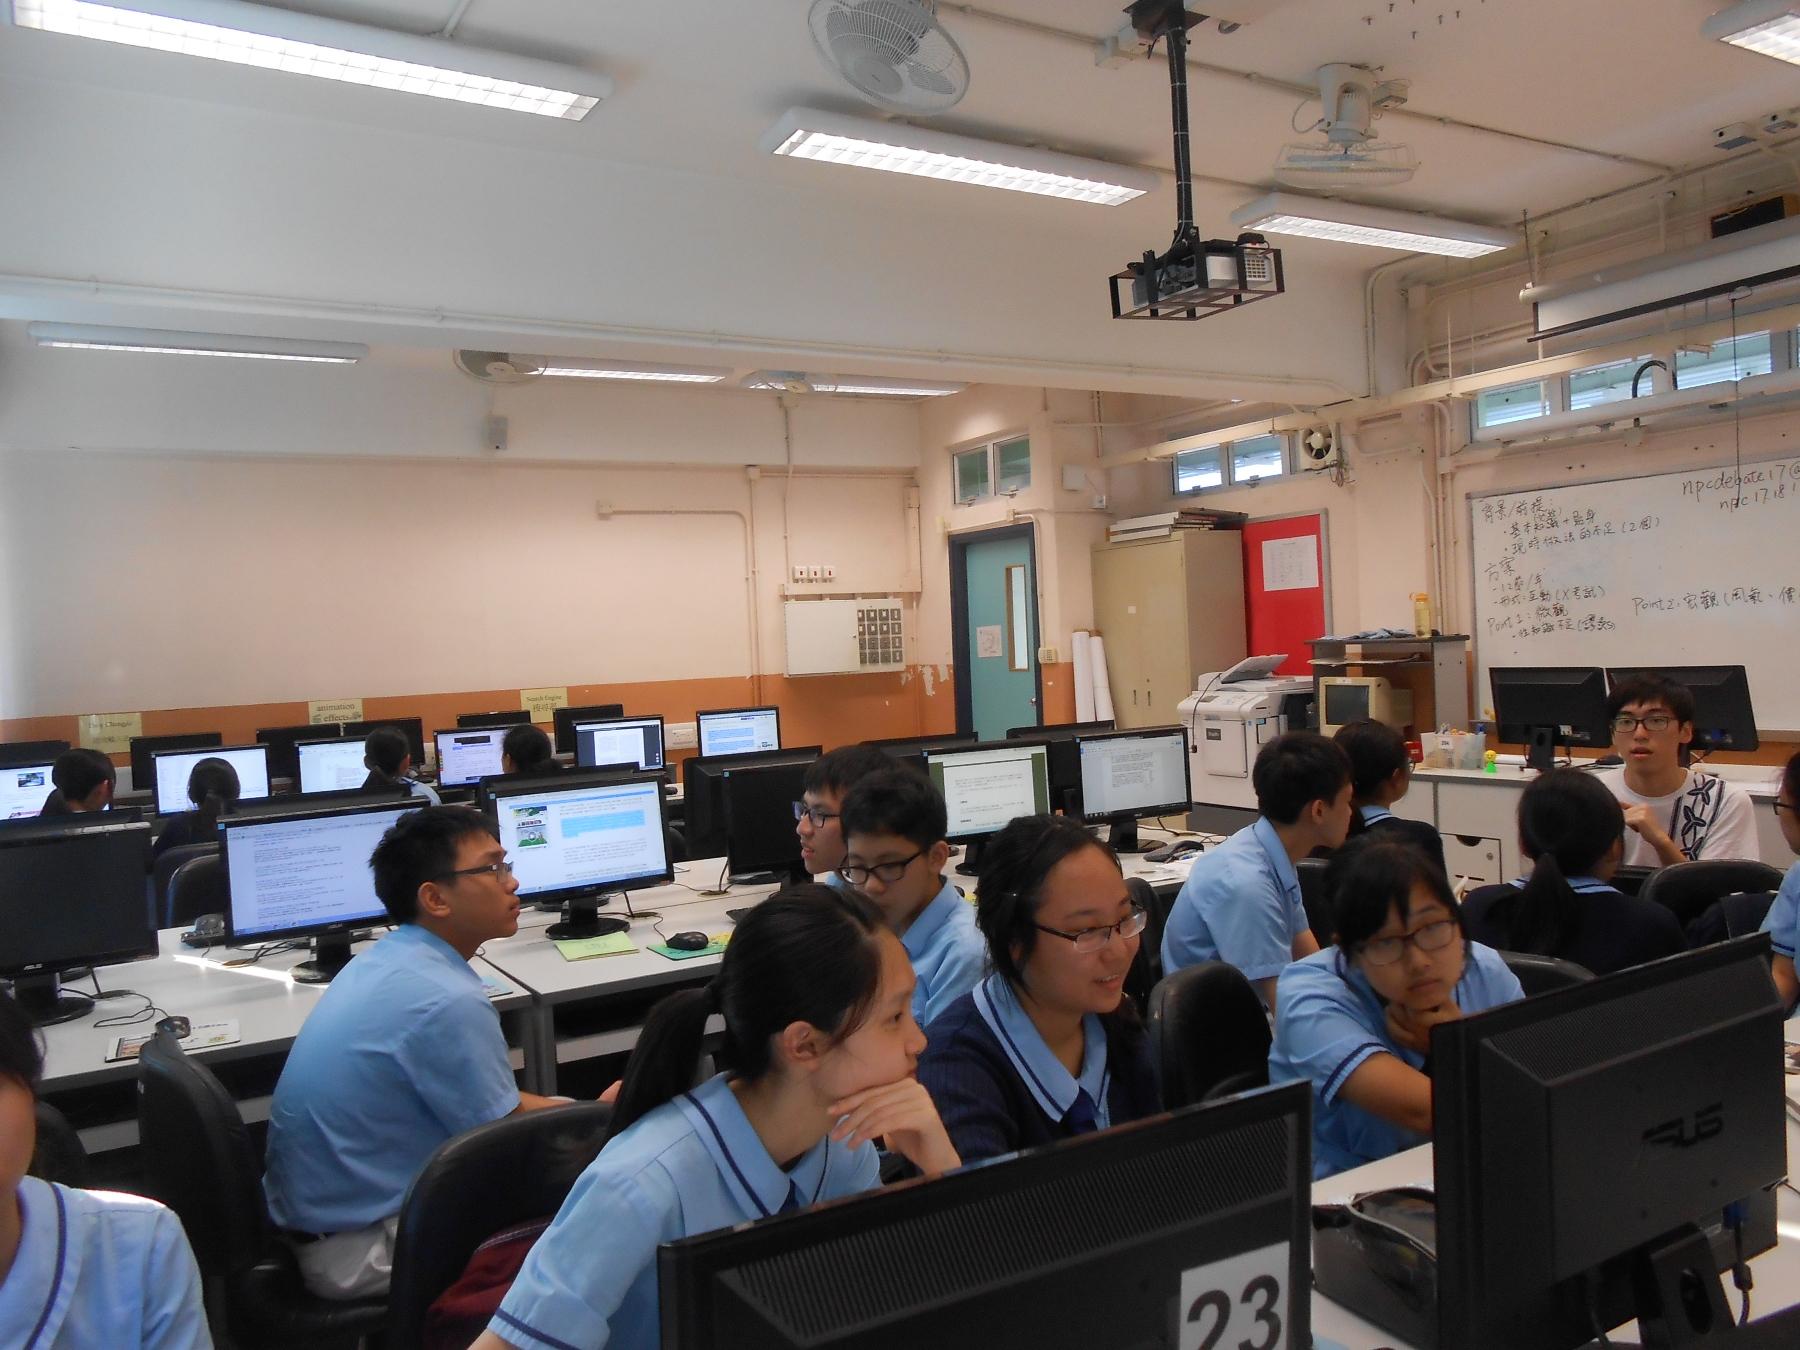 http://www.npc.edu.hk/sites/default/files/dscn1003.jpg